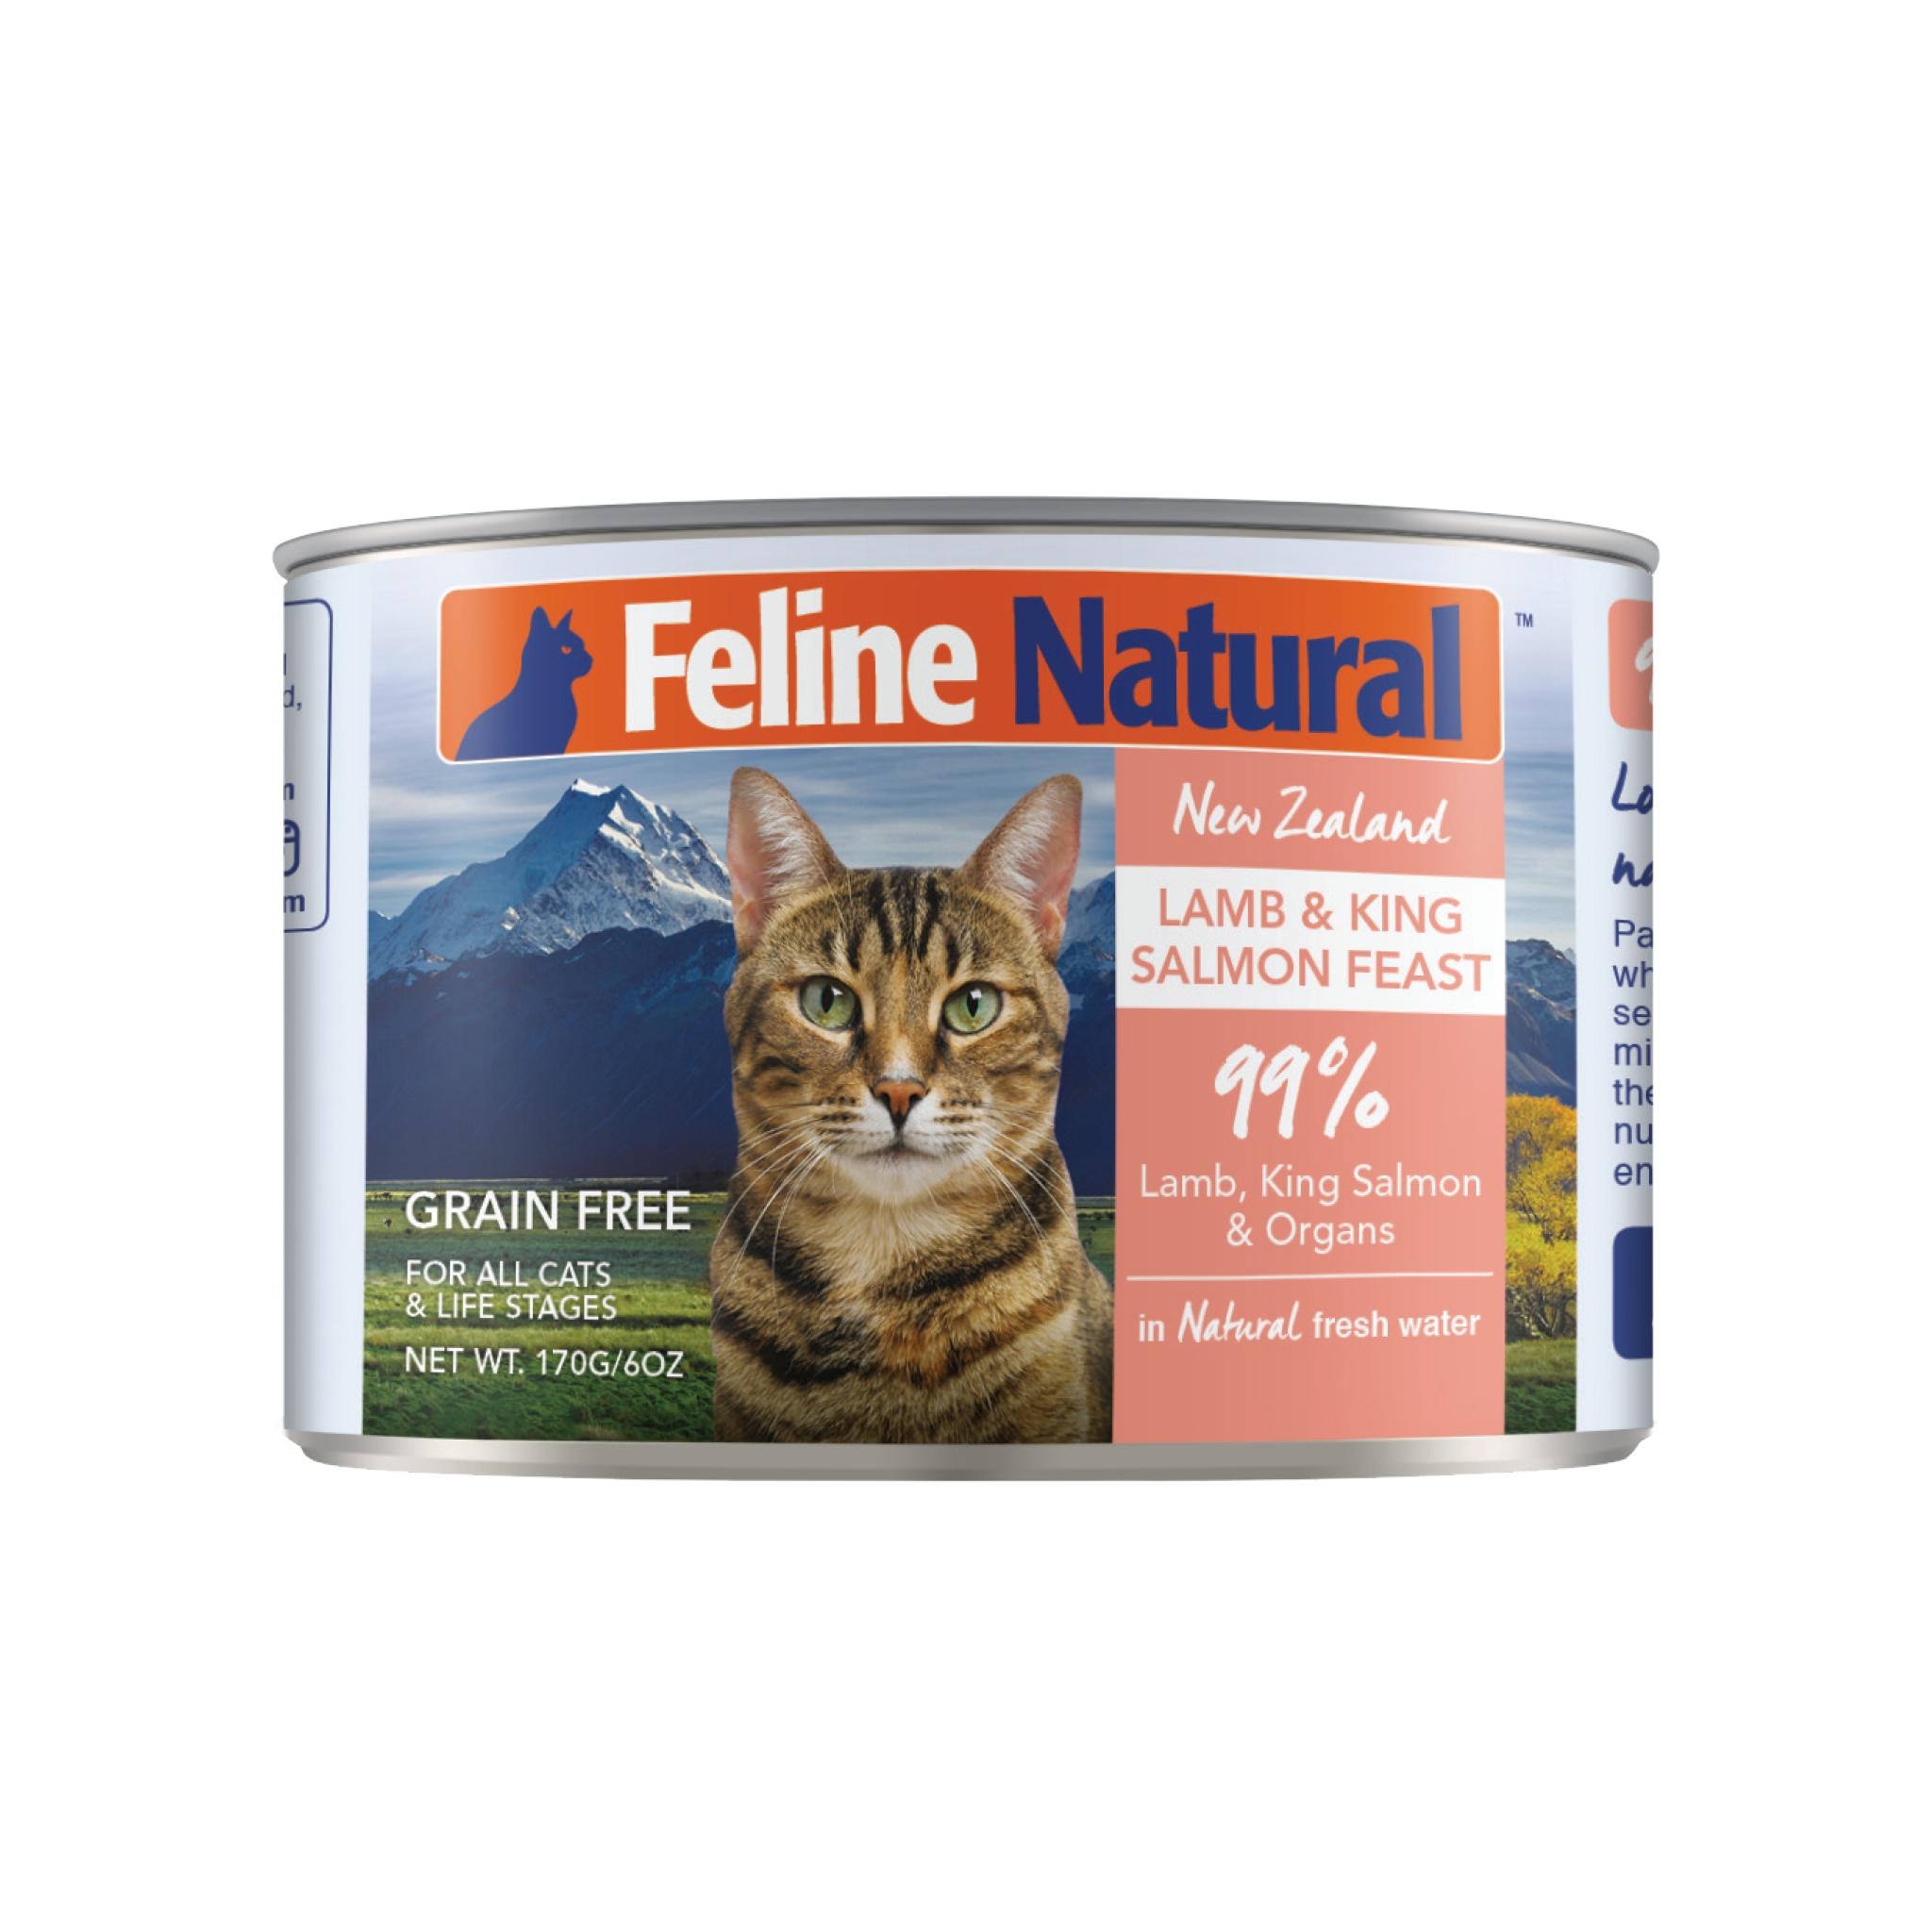 Feline Natural Feline Natural Lamb & King Salmon Feast Wet Cat Food 3oz